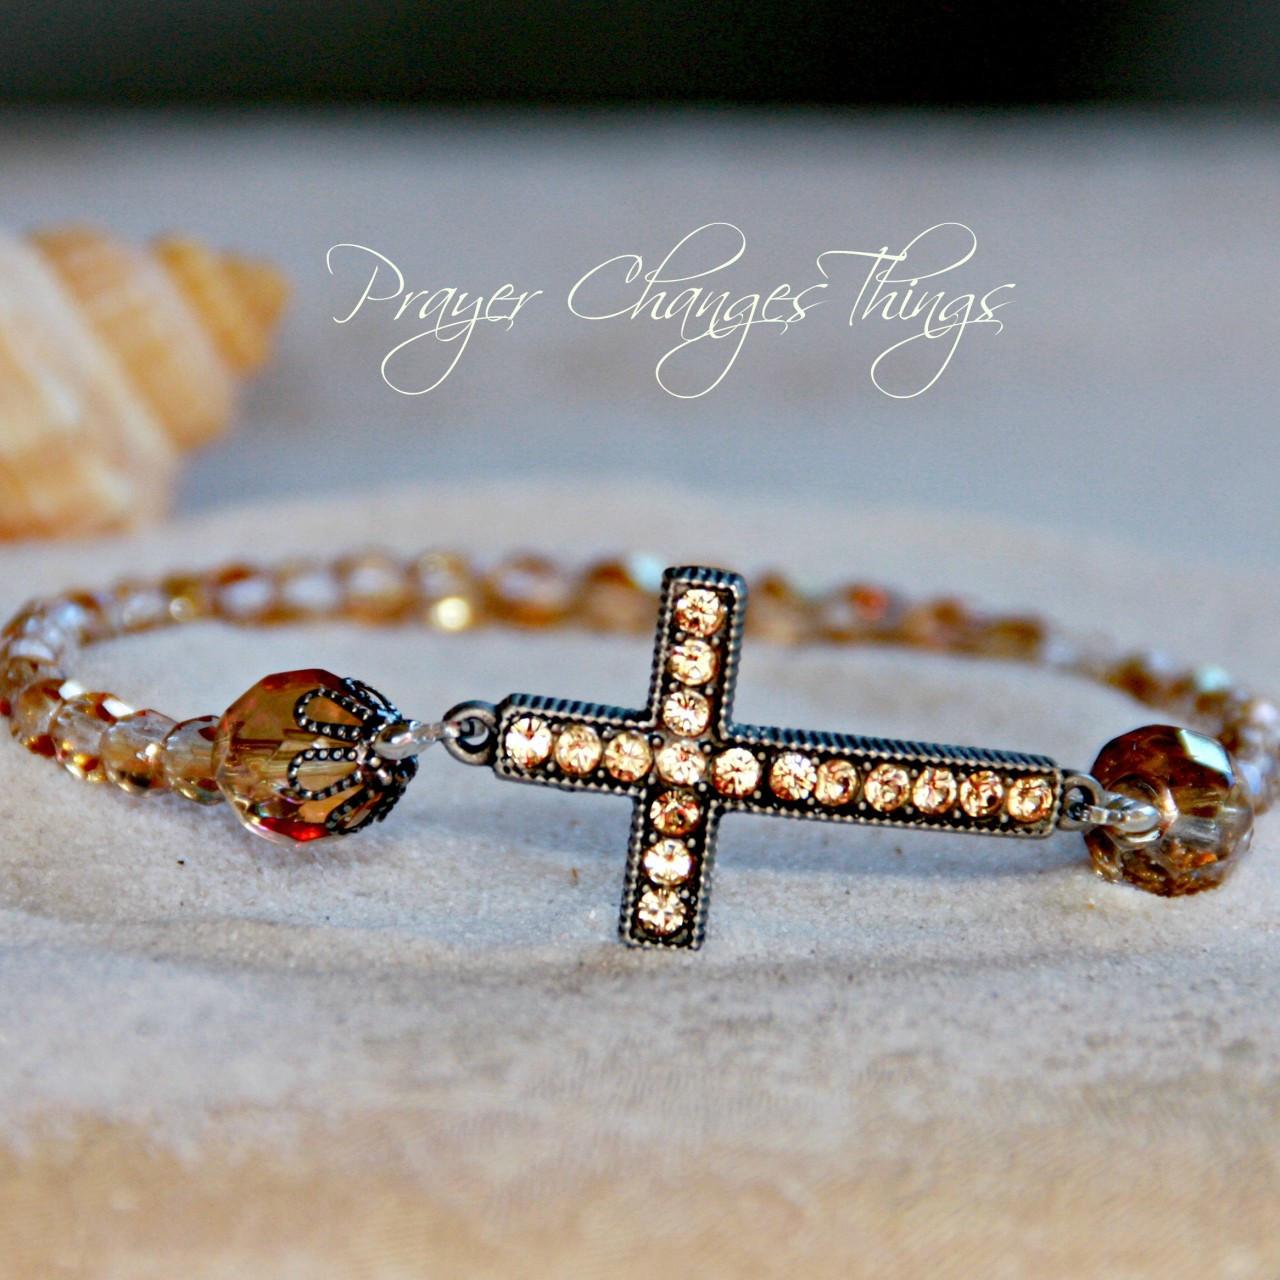 IN-101 Light Colorado Topaz Jeweled Cross Bracelet